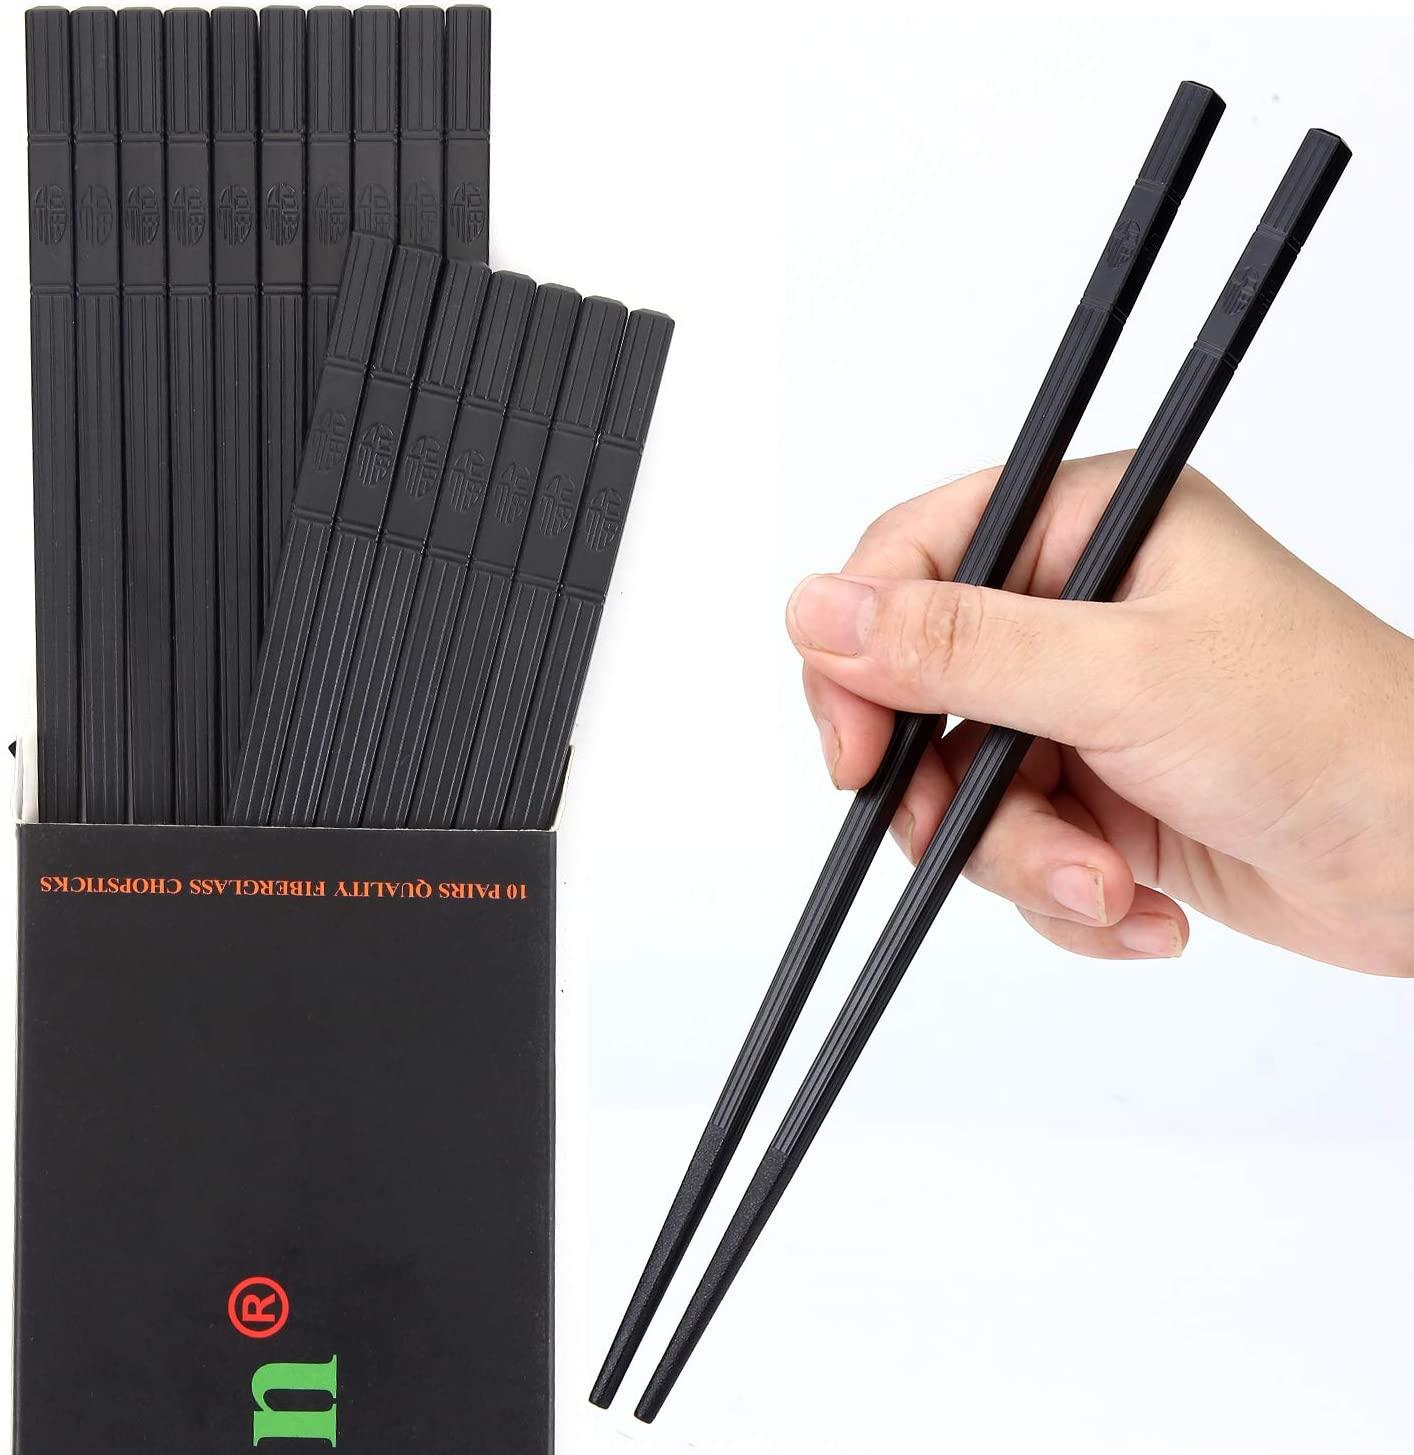 HuaLan Fiberglass Reusable Chopsticks Set Dishwasher-Safe Household/Restaurant/Sushi Chopsticks 10 Pairs